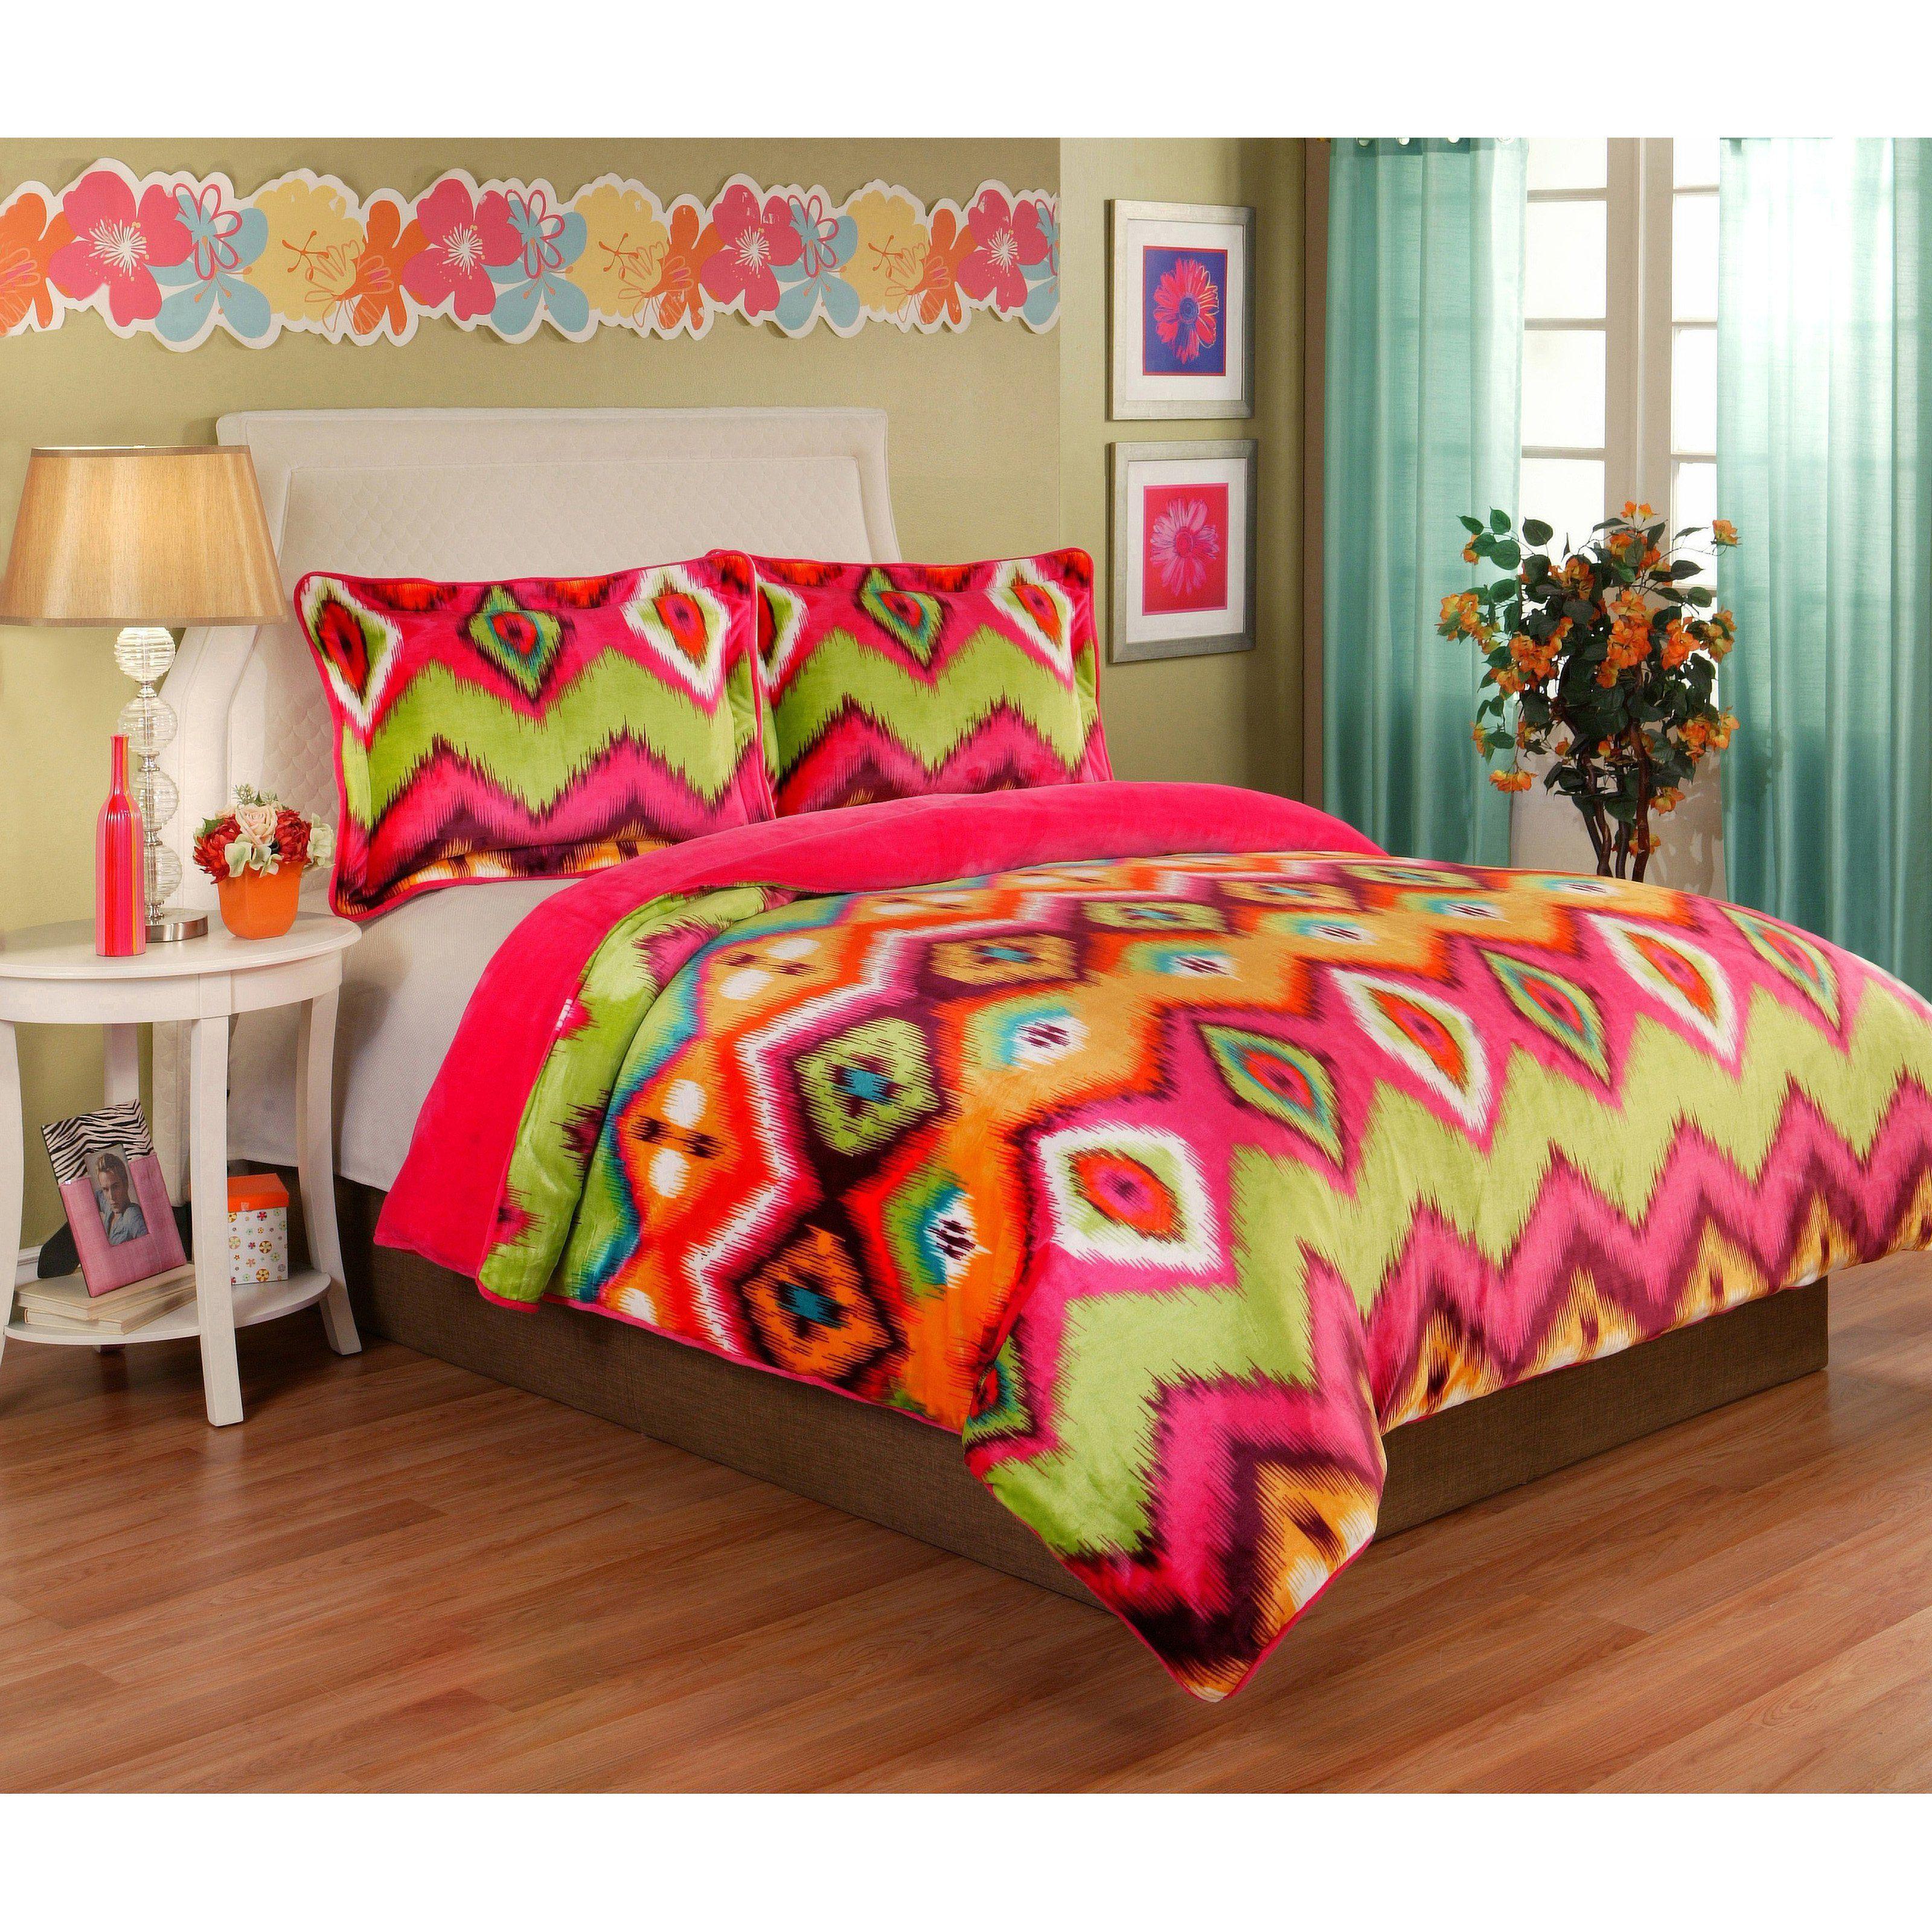 b7b4f4756719f1bb28b0ddfb6cf0cfbb - Better Homes And Gardens Baylee Quilt